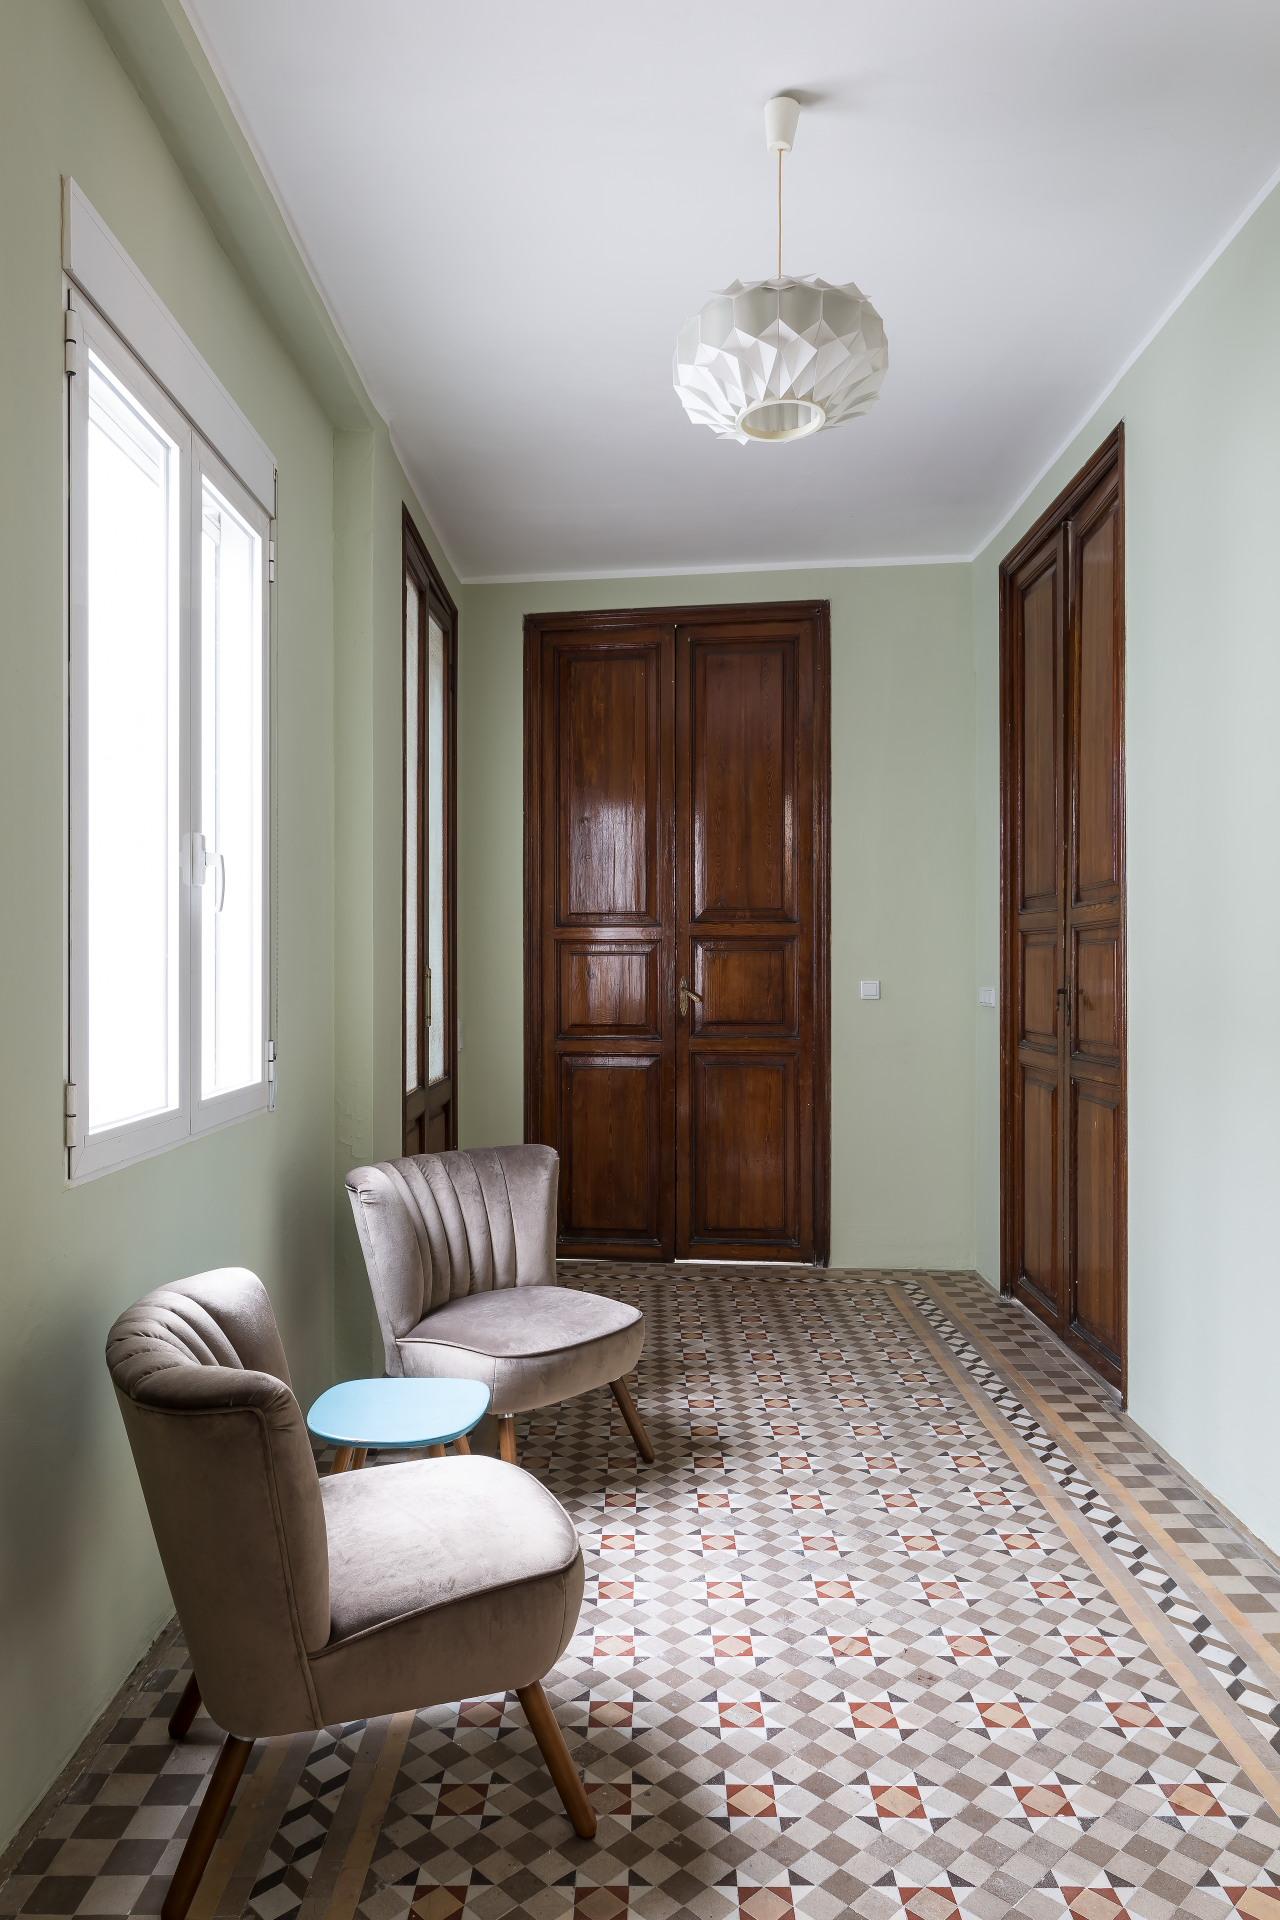 fotografia-arquitectura-interiorismo-valencia-german-cabo-lliberos-naquera-aya (2)